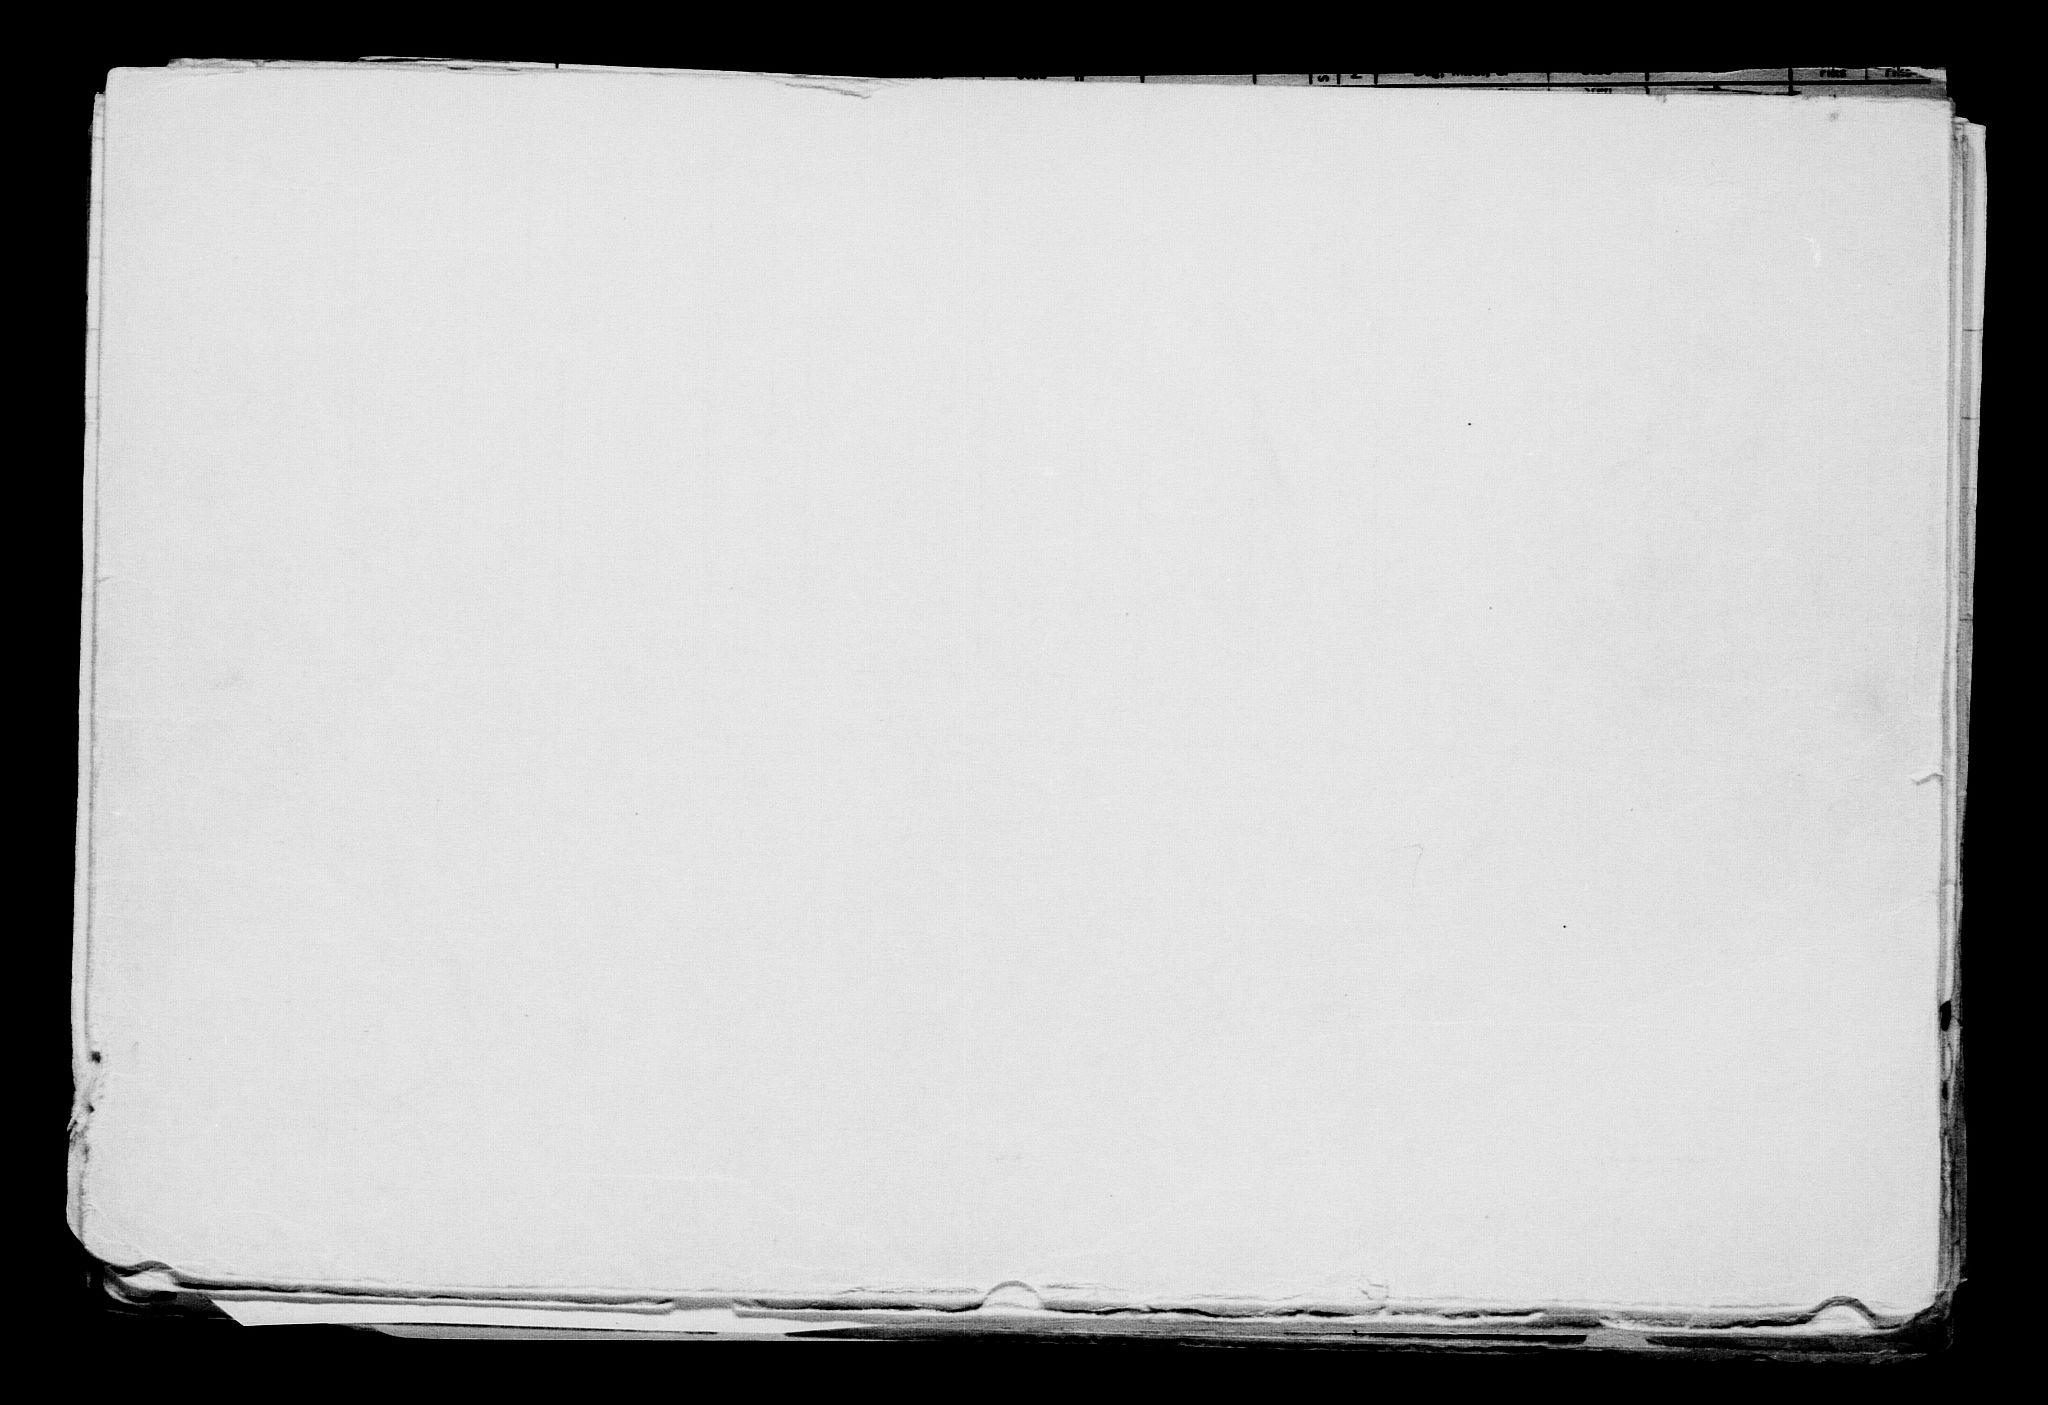 RA, Direktoratet for sjømenn, G/Gb/L0038: Hovedkort, 1900-1901, s. 373